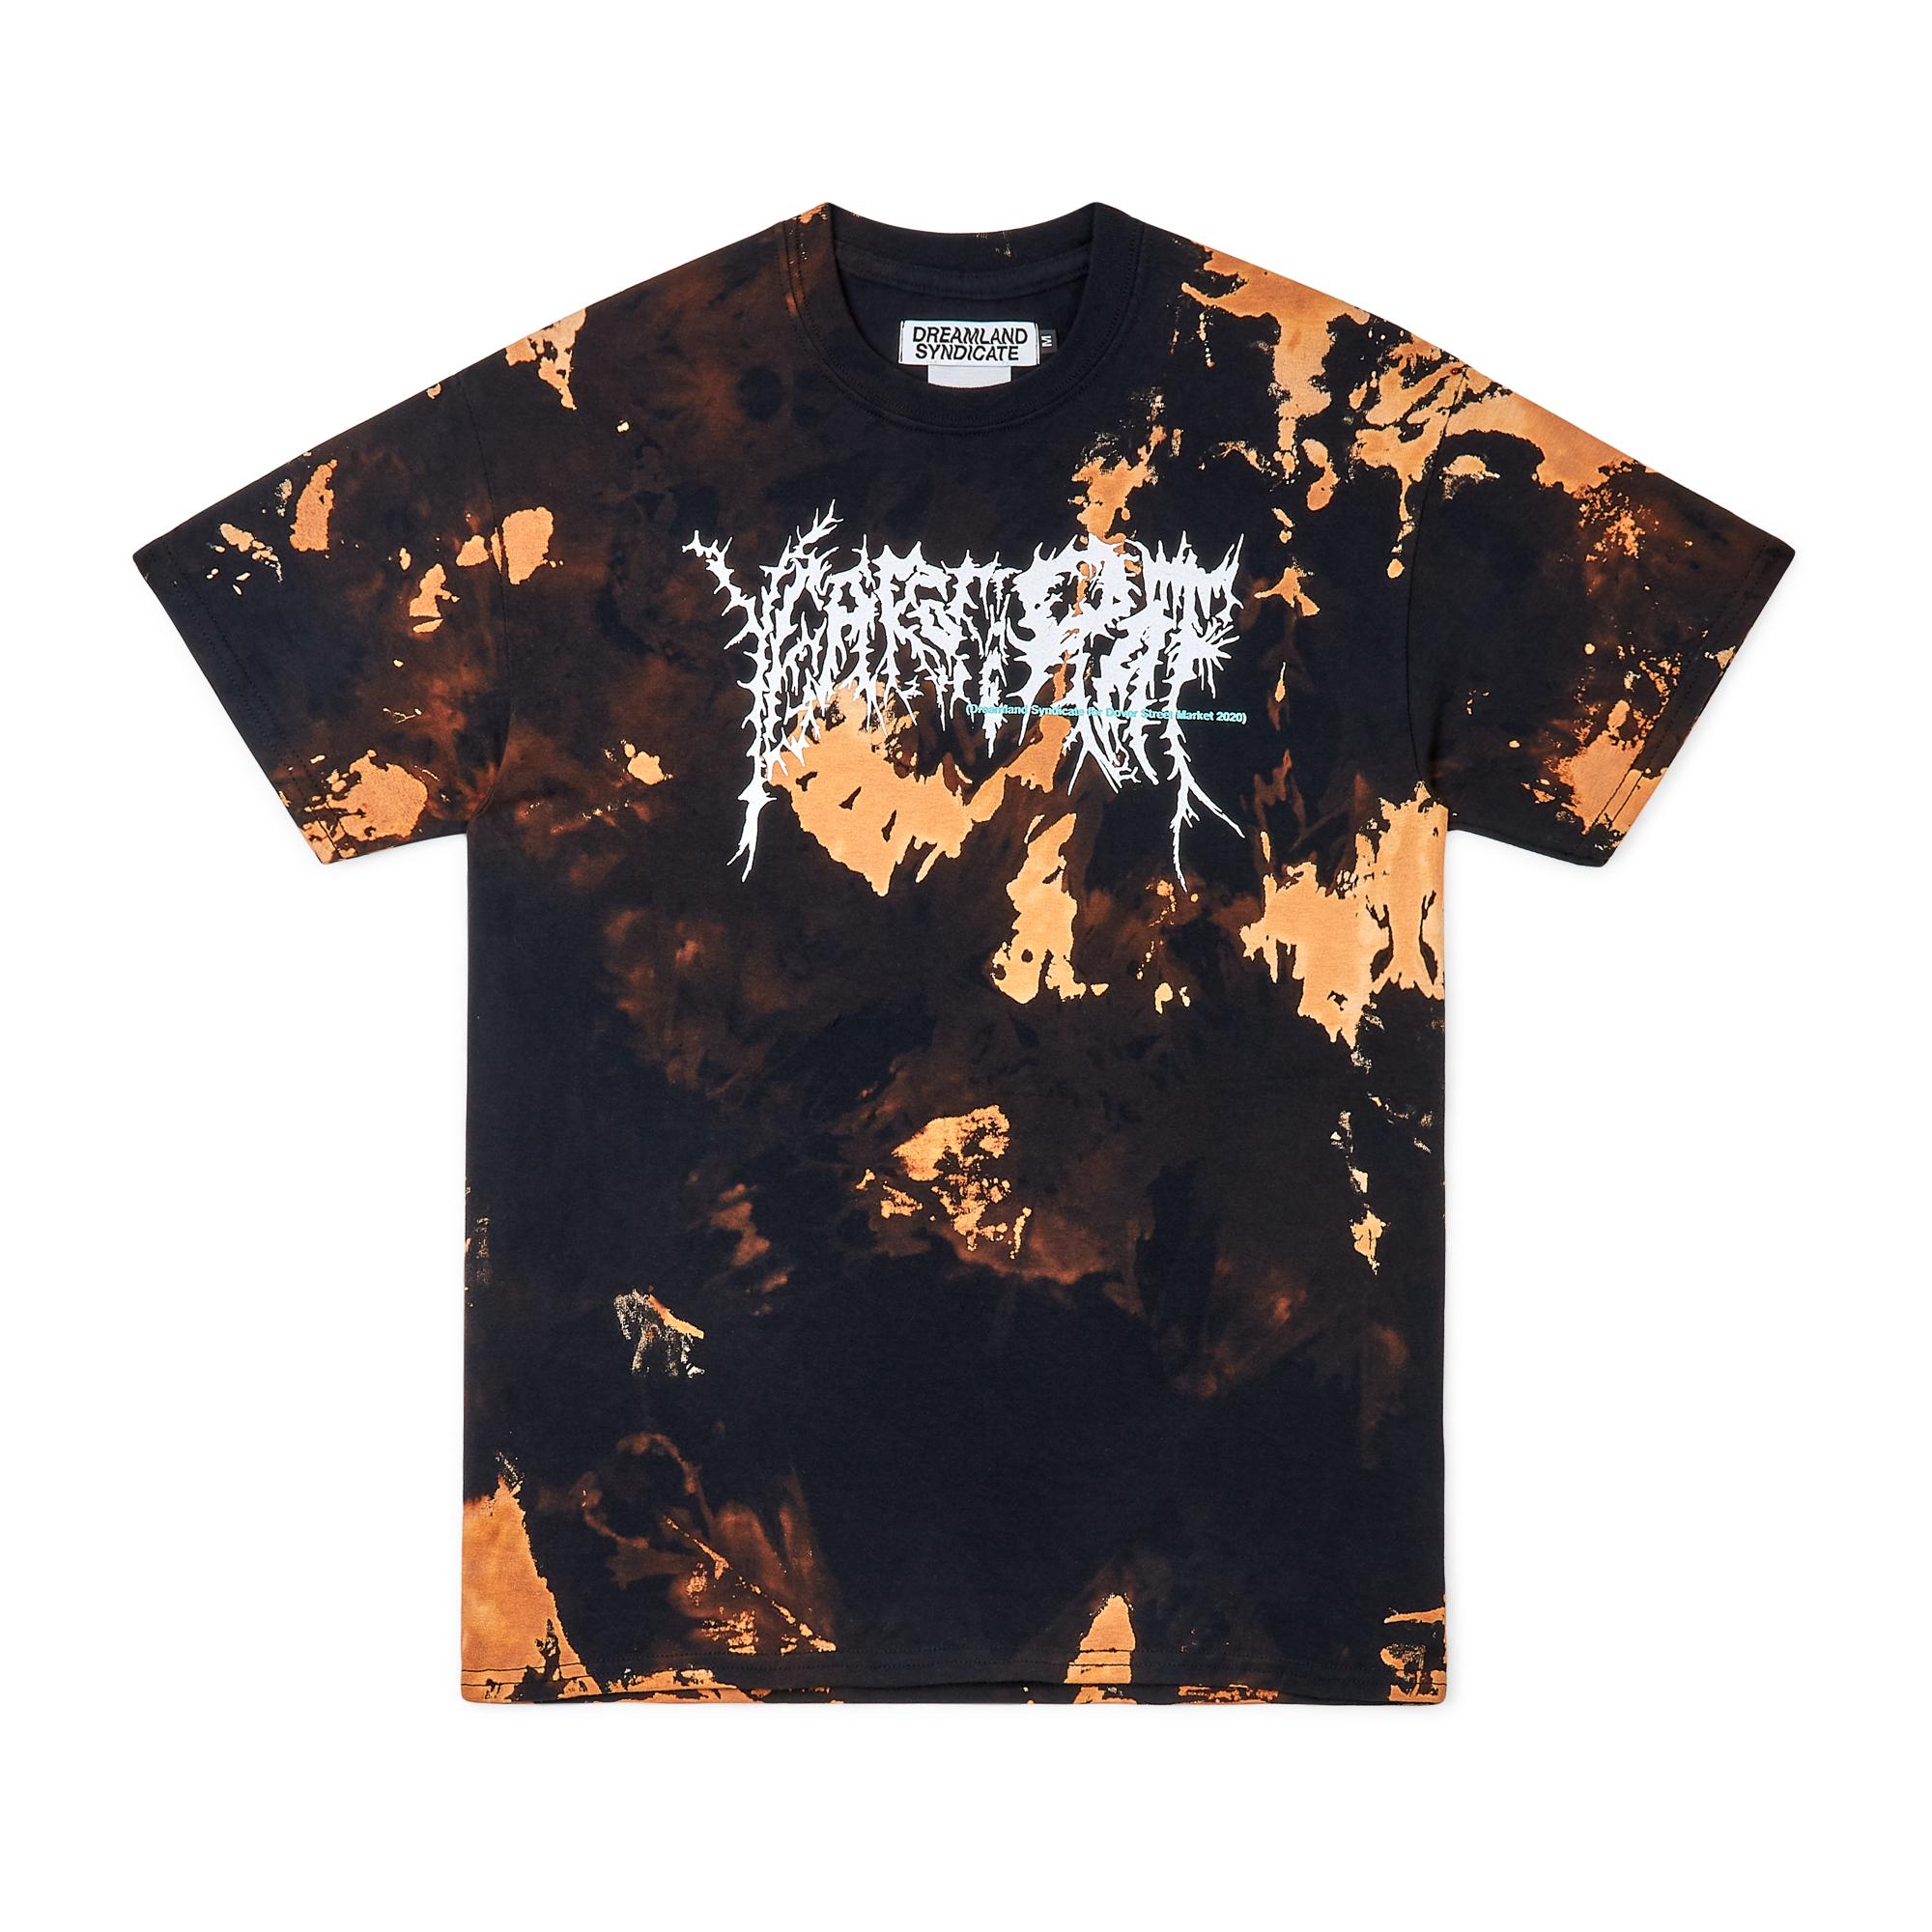 YOTR-T-shirts_Dreamland_032.jpg